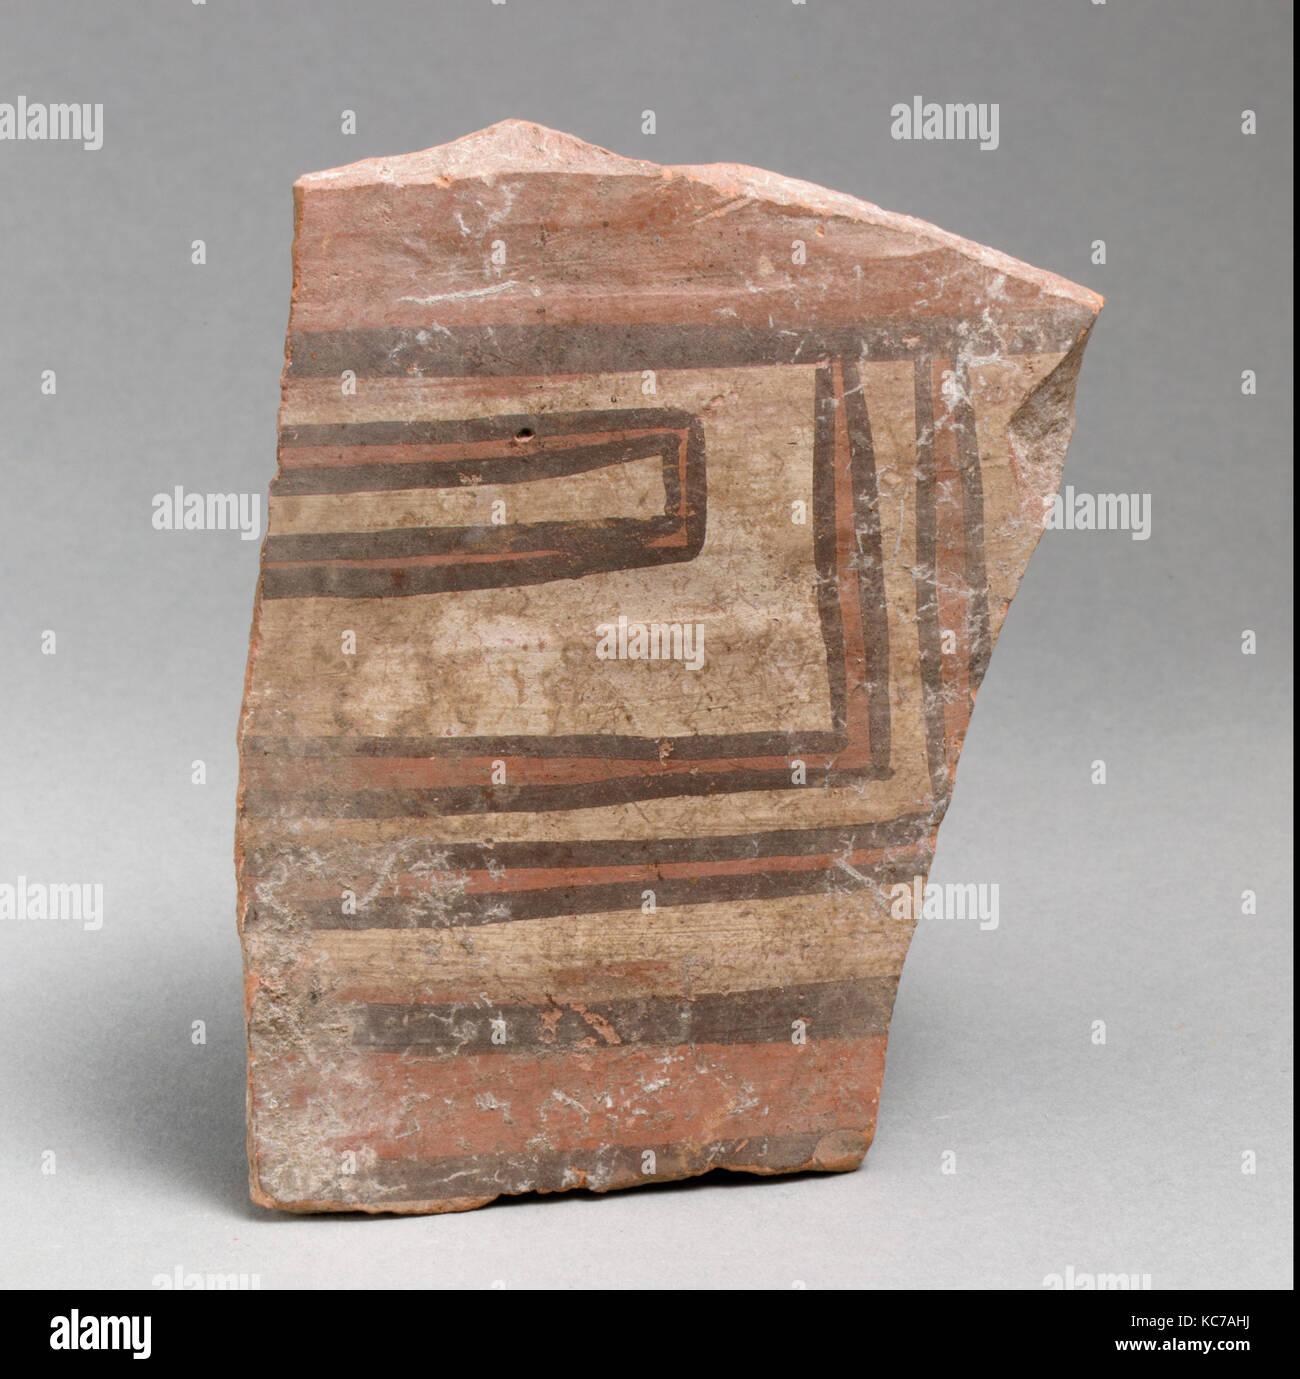 Vase fragment, Archaic, East Greek/Sardis, Lydian, Terracotta, Overall: 4 5/8 x 3 7/16in. (11.7 x 8.8cm), Vases - Stock Image